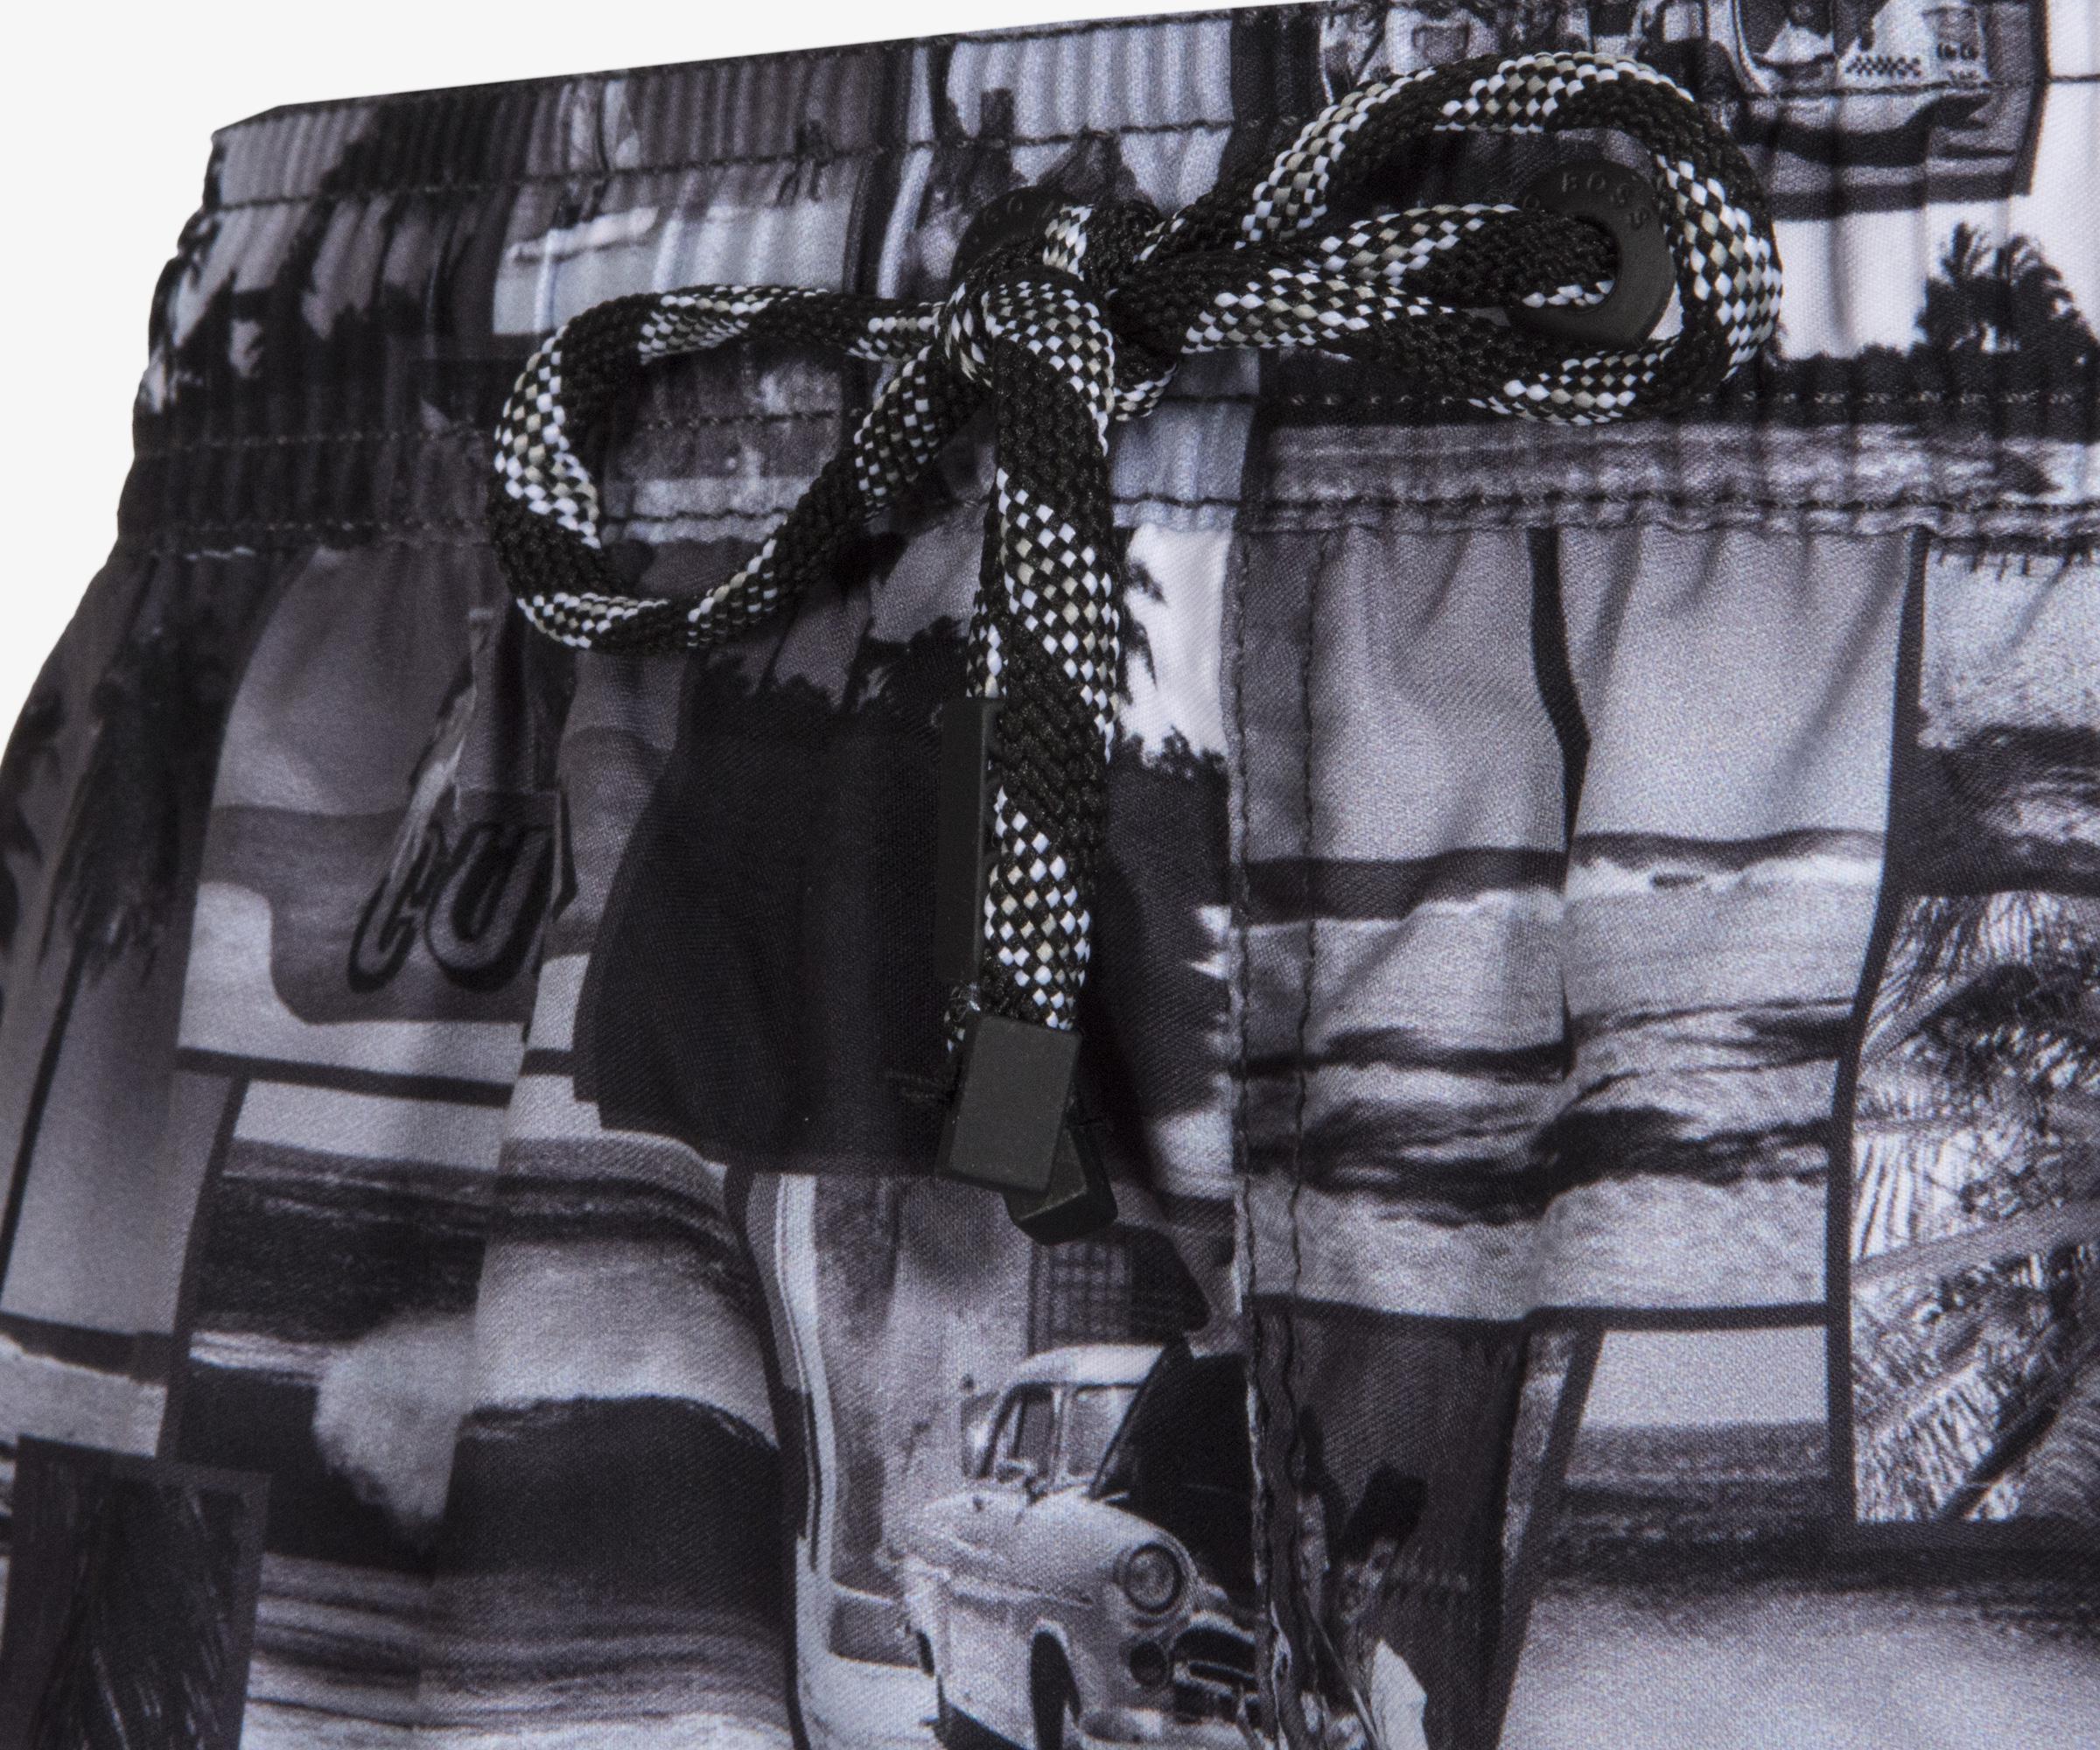 3acbda7b51 BOSS - 'springfish' Quick Dry Cuba Lifestyle Print Swim Shorts Black &  White for. View fullscreen